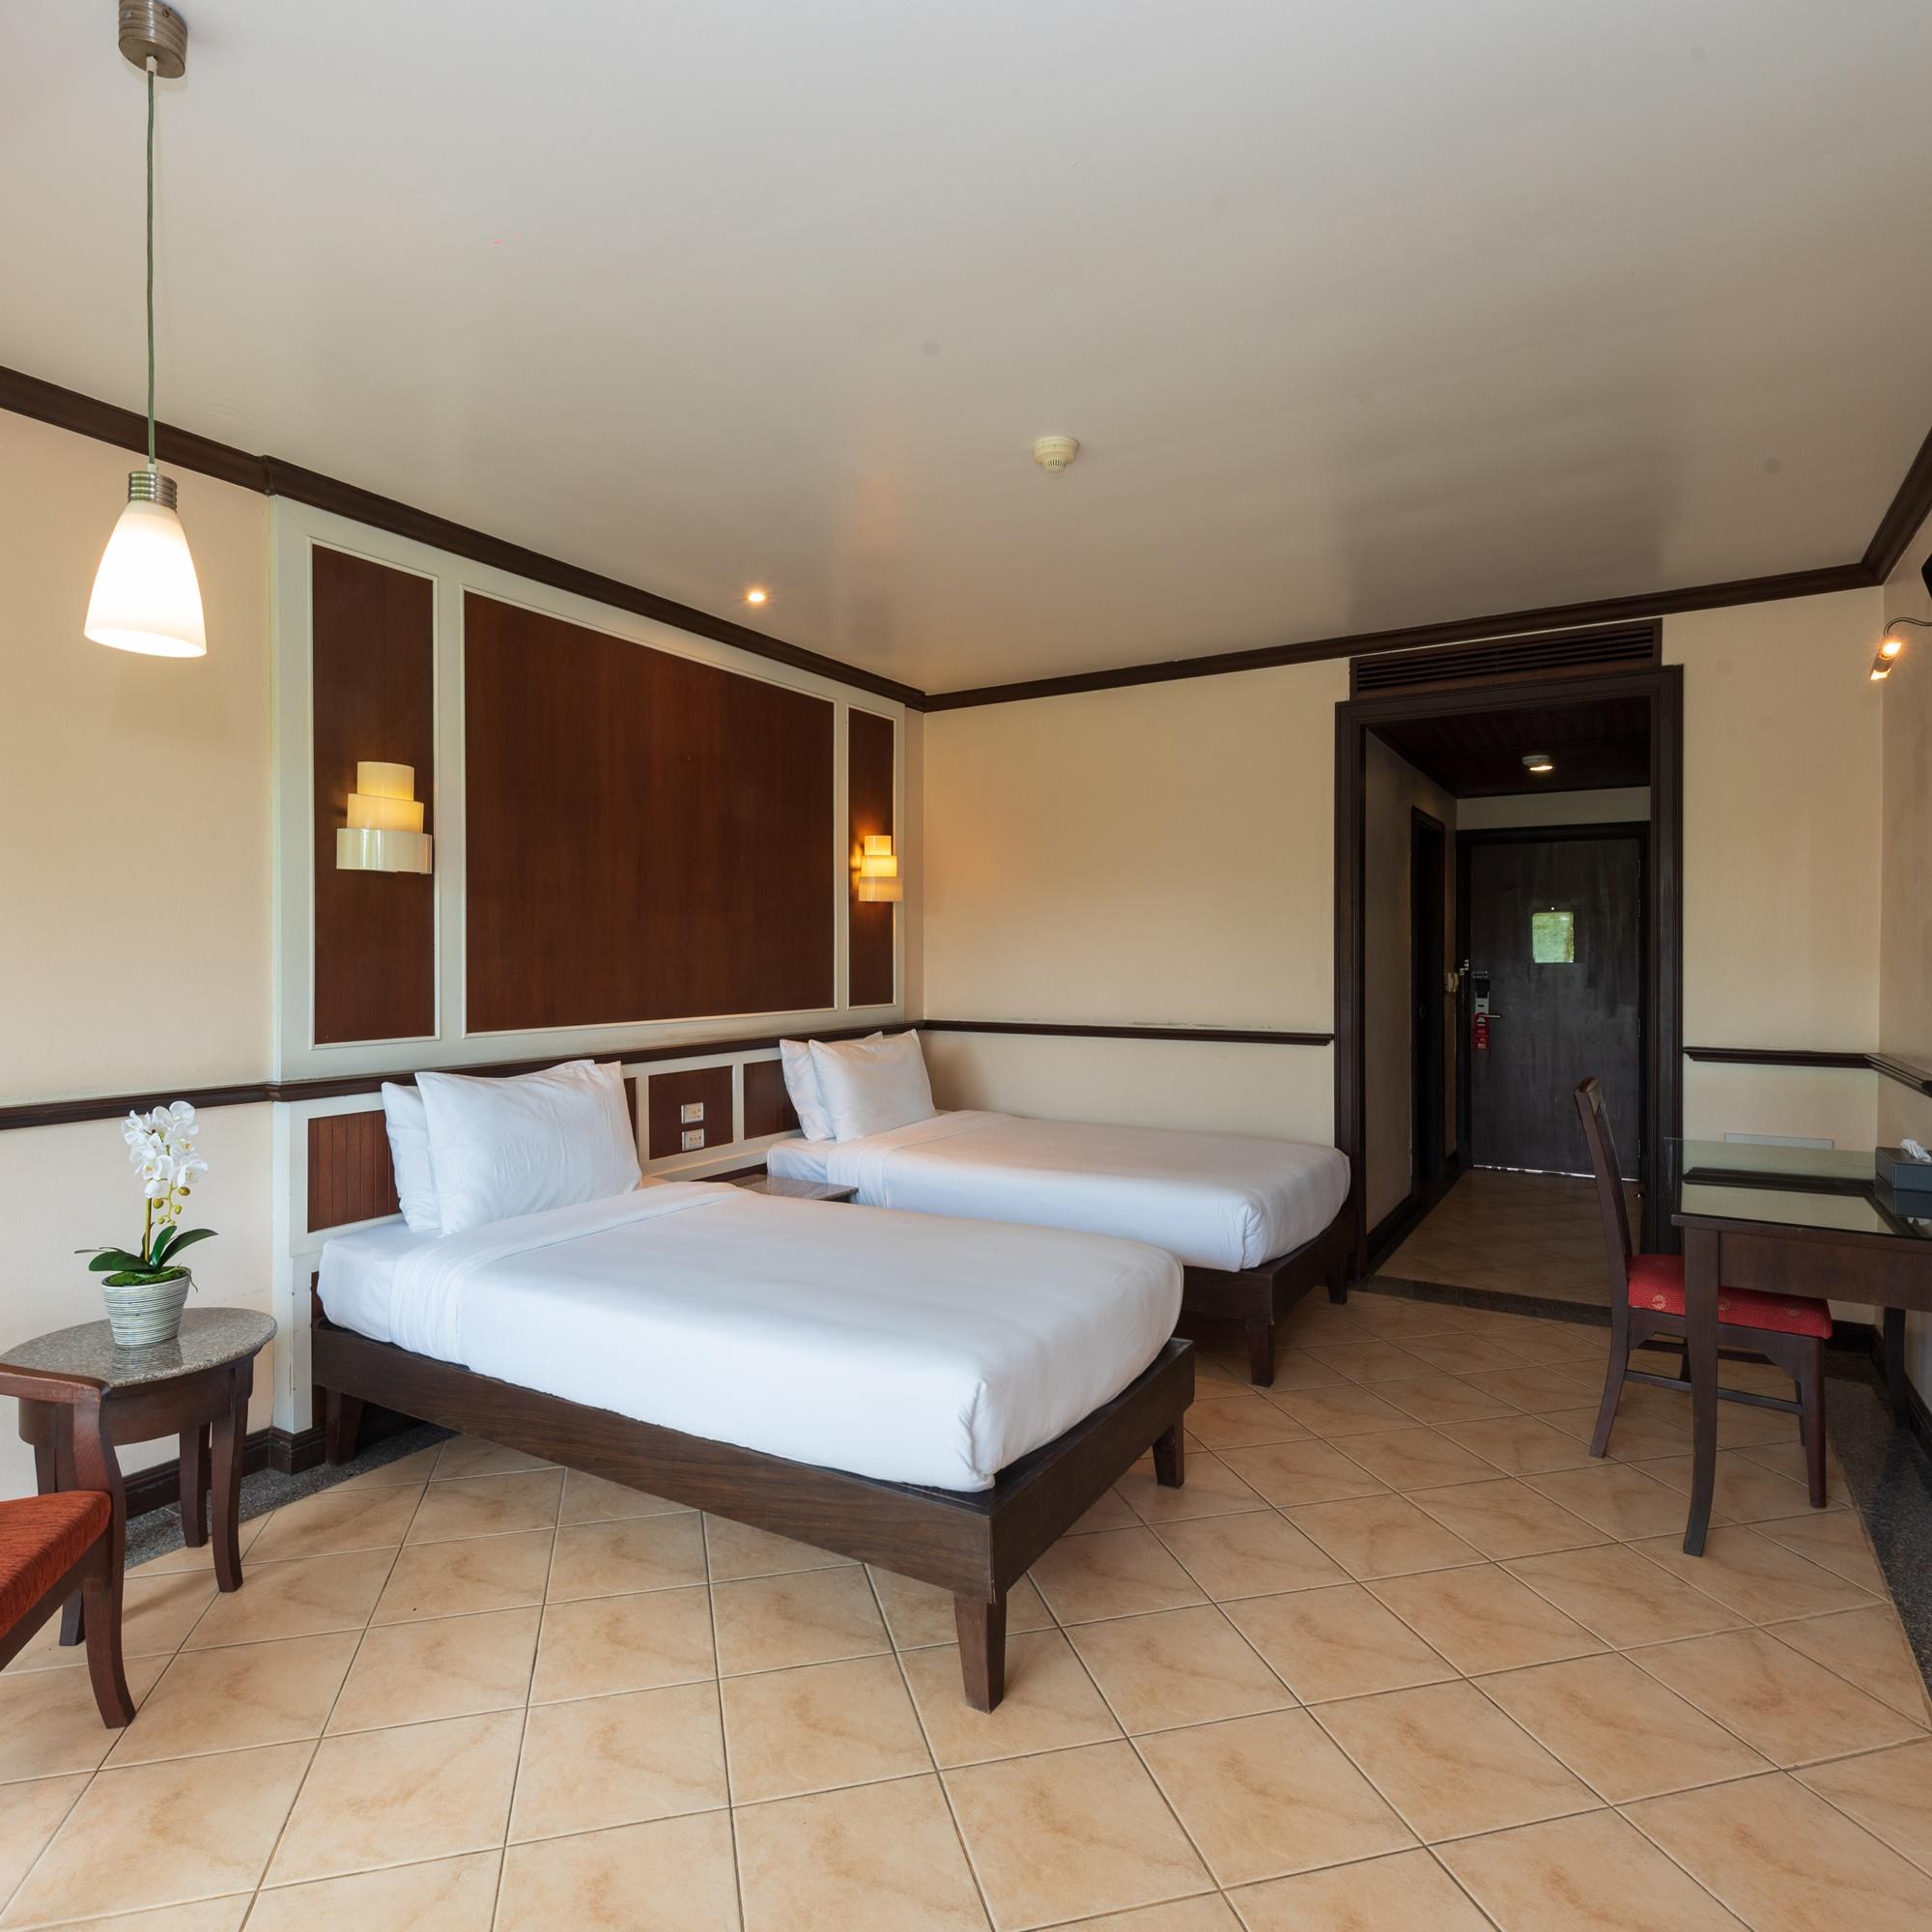 Deluxe Room | Pattaya Beach Hotel - Pinnacle Grand Jomtien